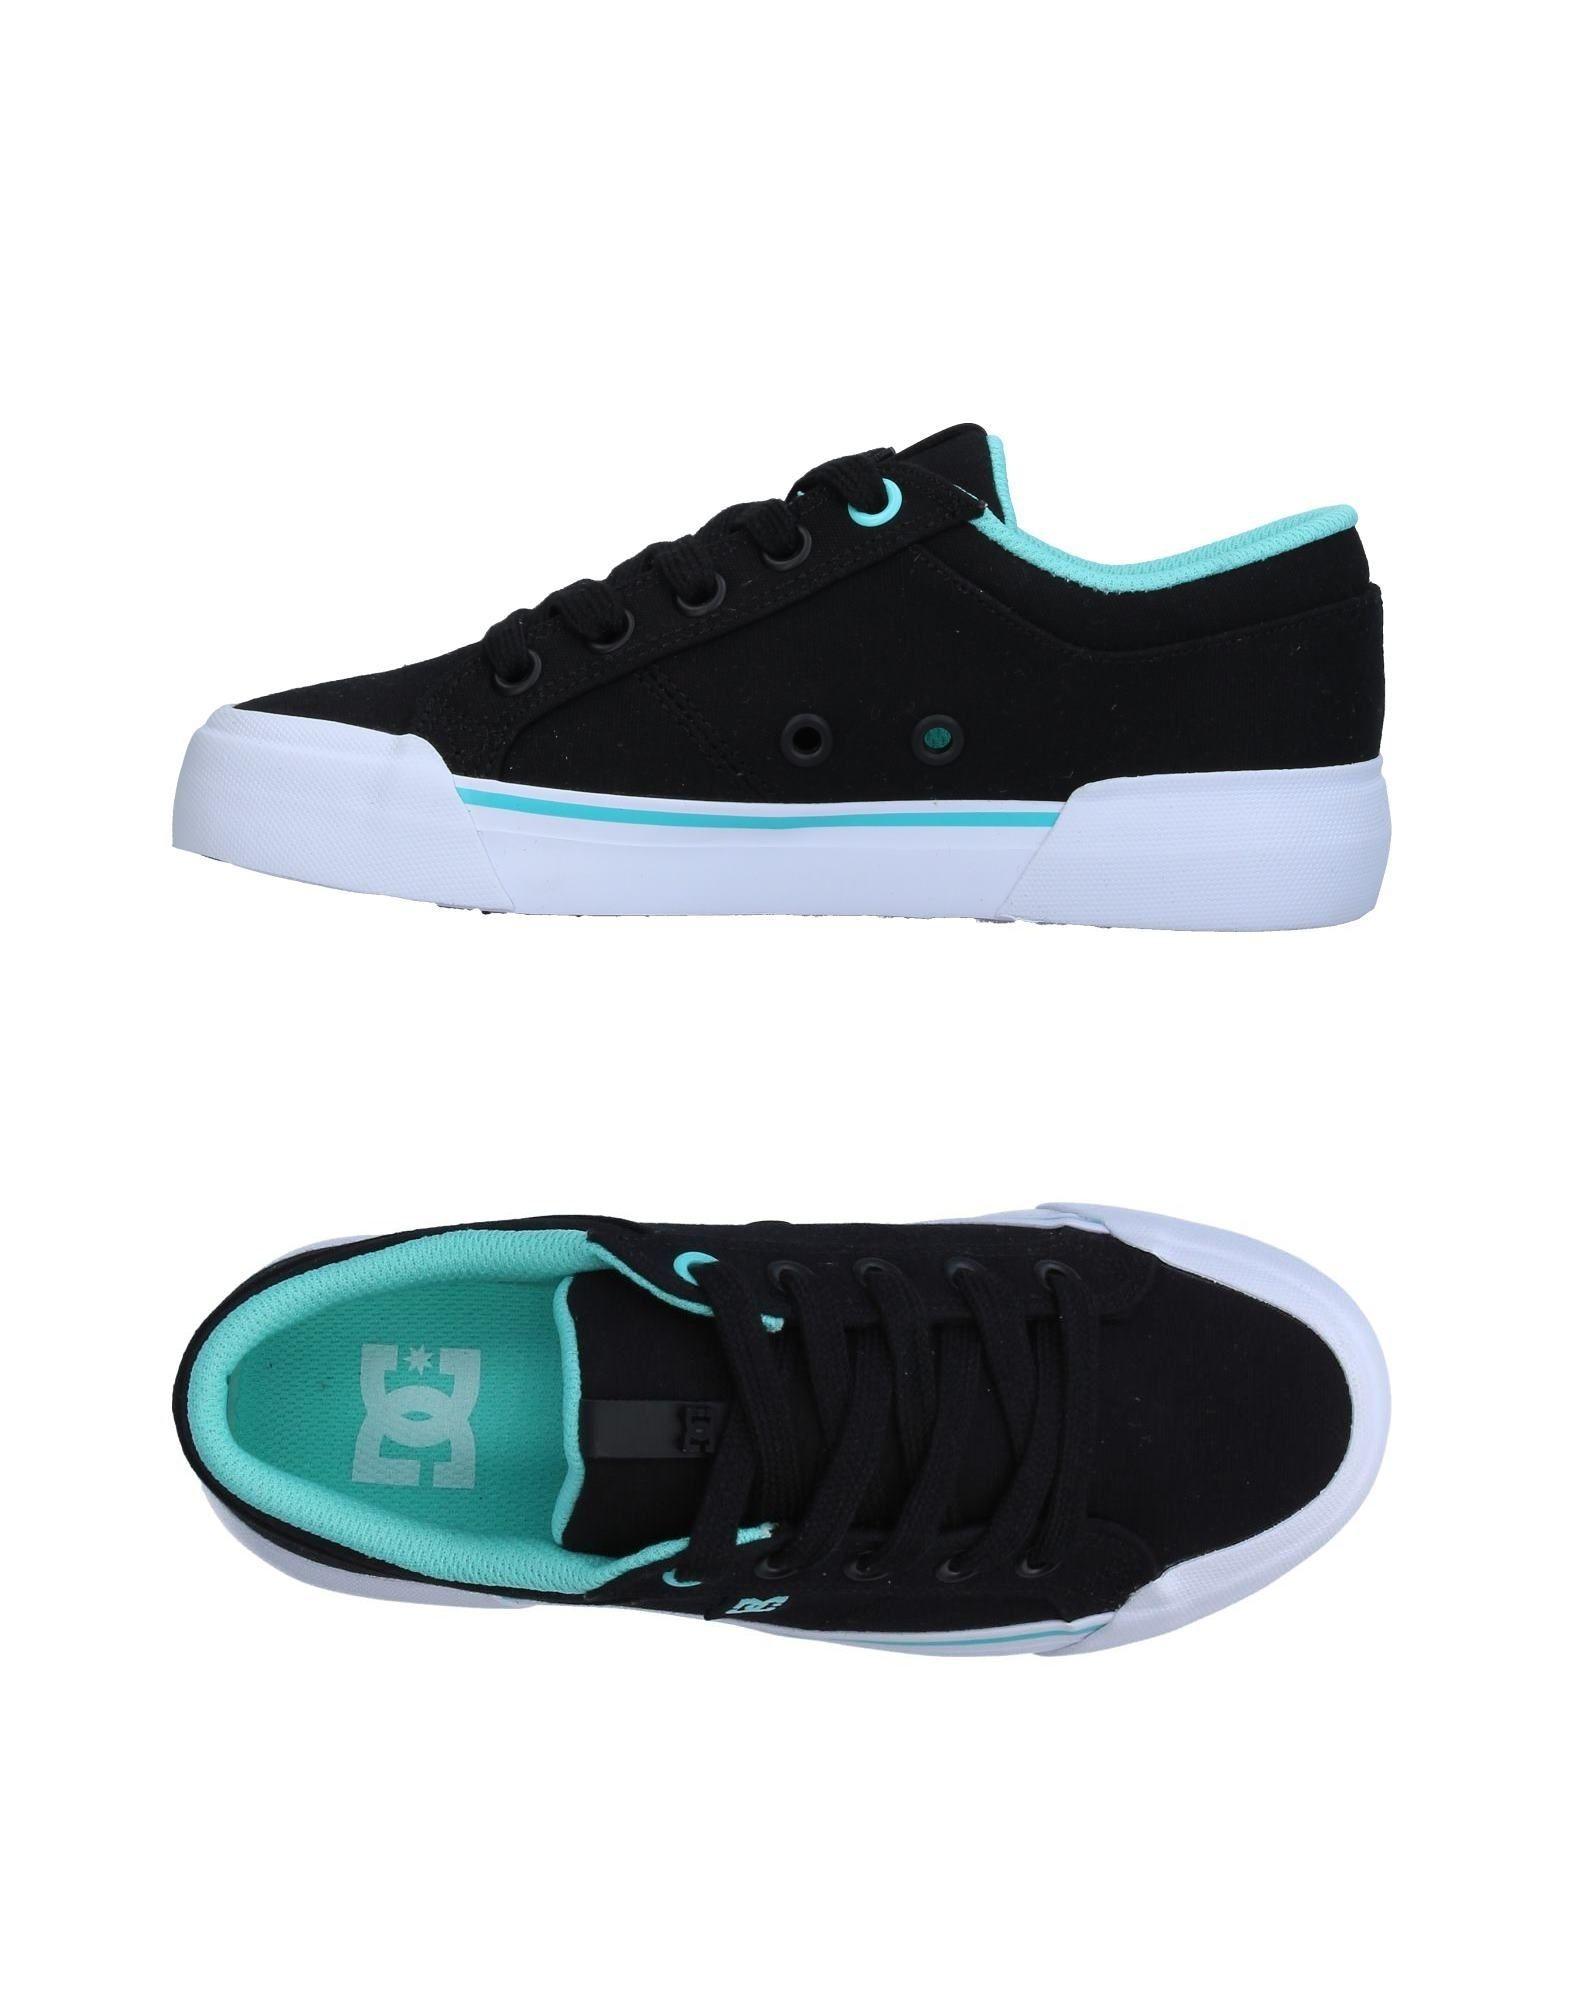 DC SHOECOUSA Низкие кеды и кроссовки кеды кроссовки высокие женские dc evan txse blue brown white